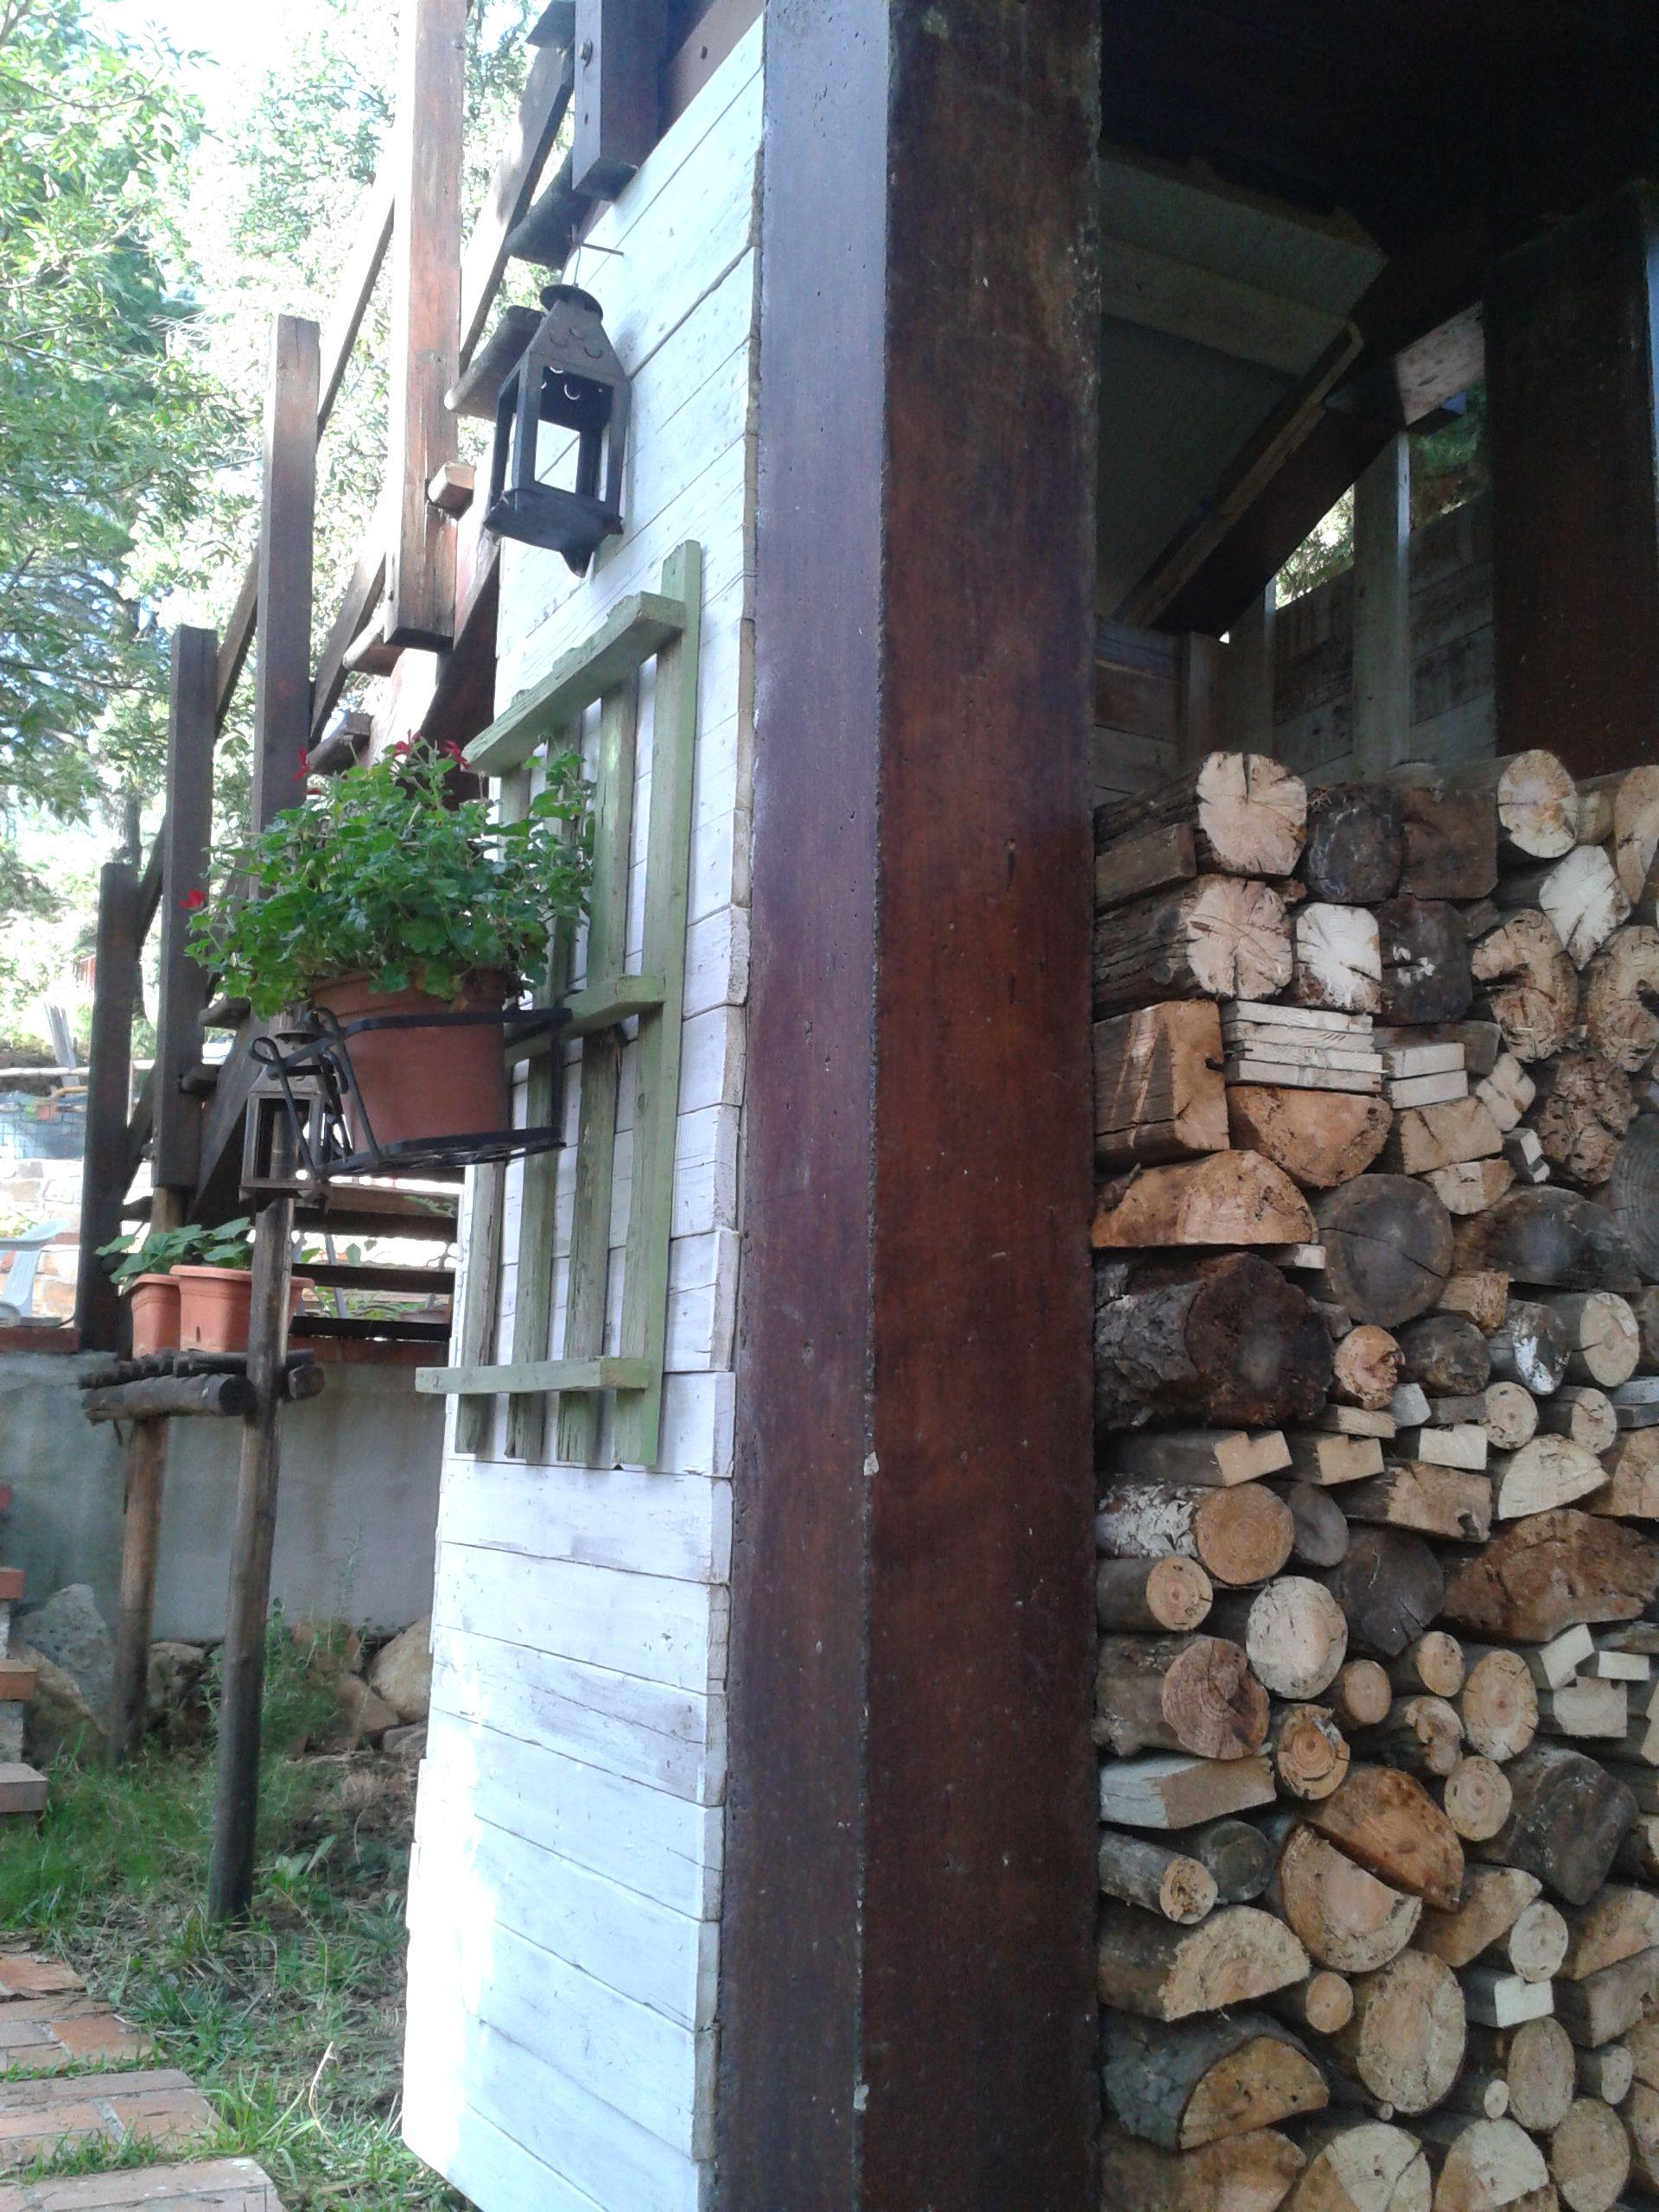 assi di legno ruvido per un tavolo assi di legno ruvido per ...